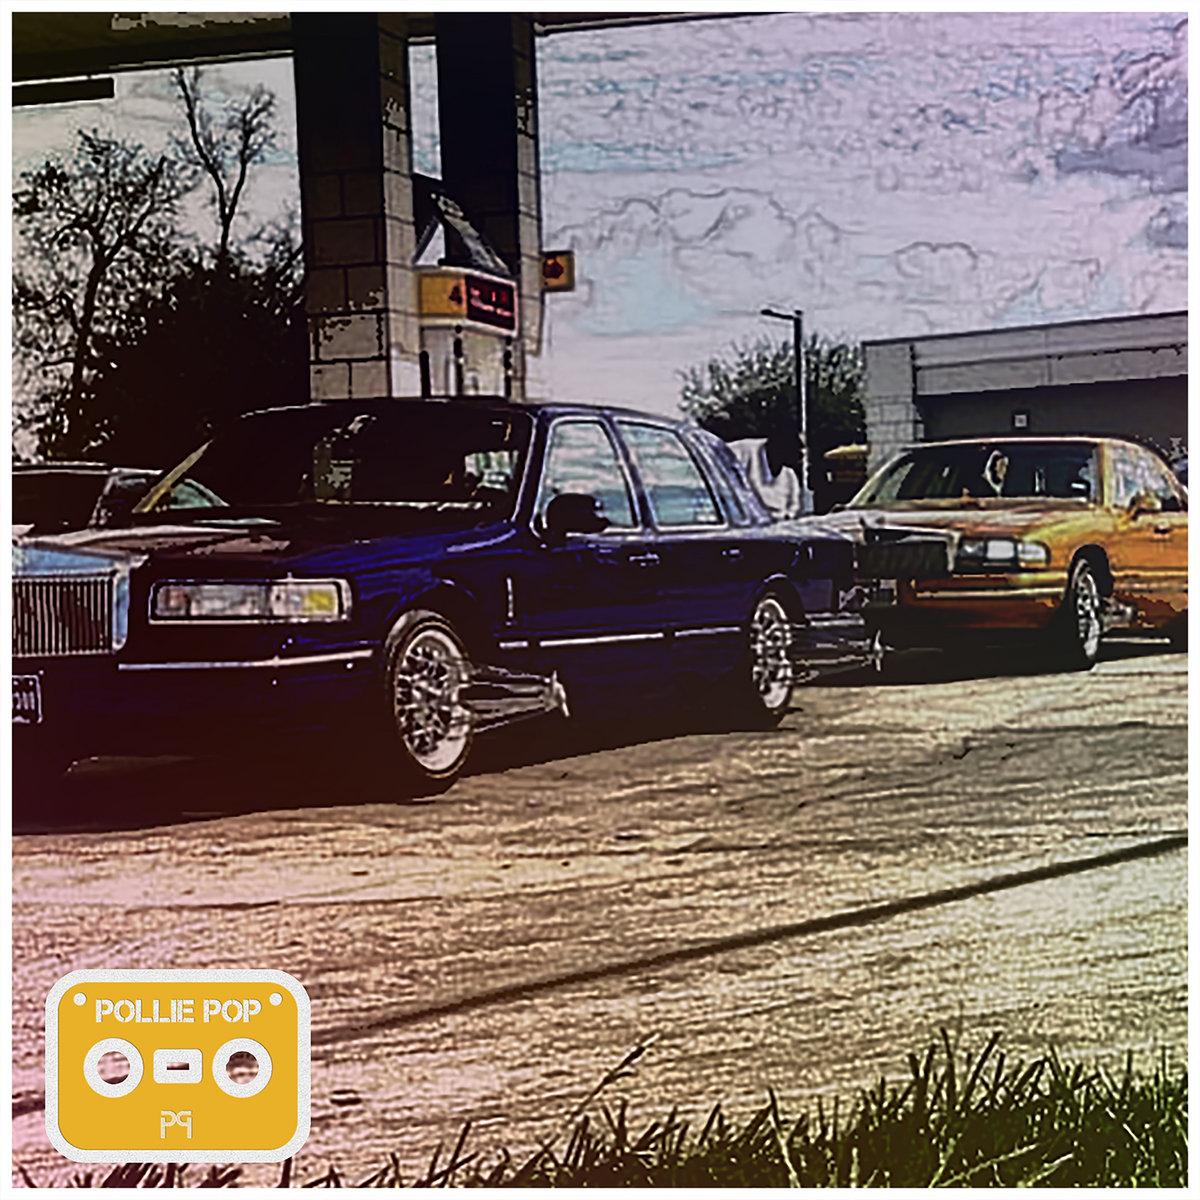 3cecd439c188 Let It Fly #Screwed (feat. Lil Wayne & Travis Scott) | Pollie Pop